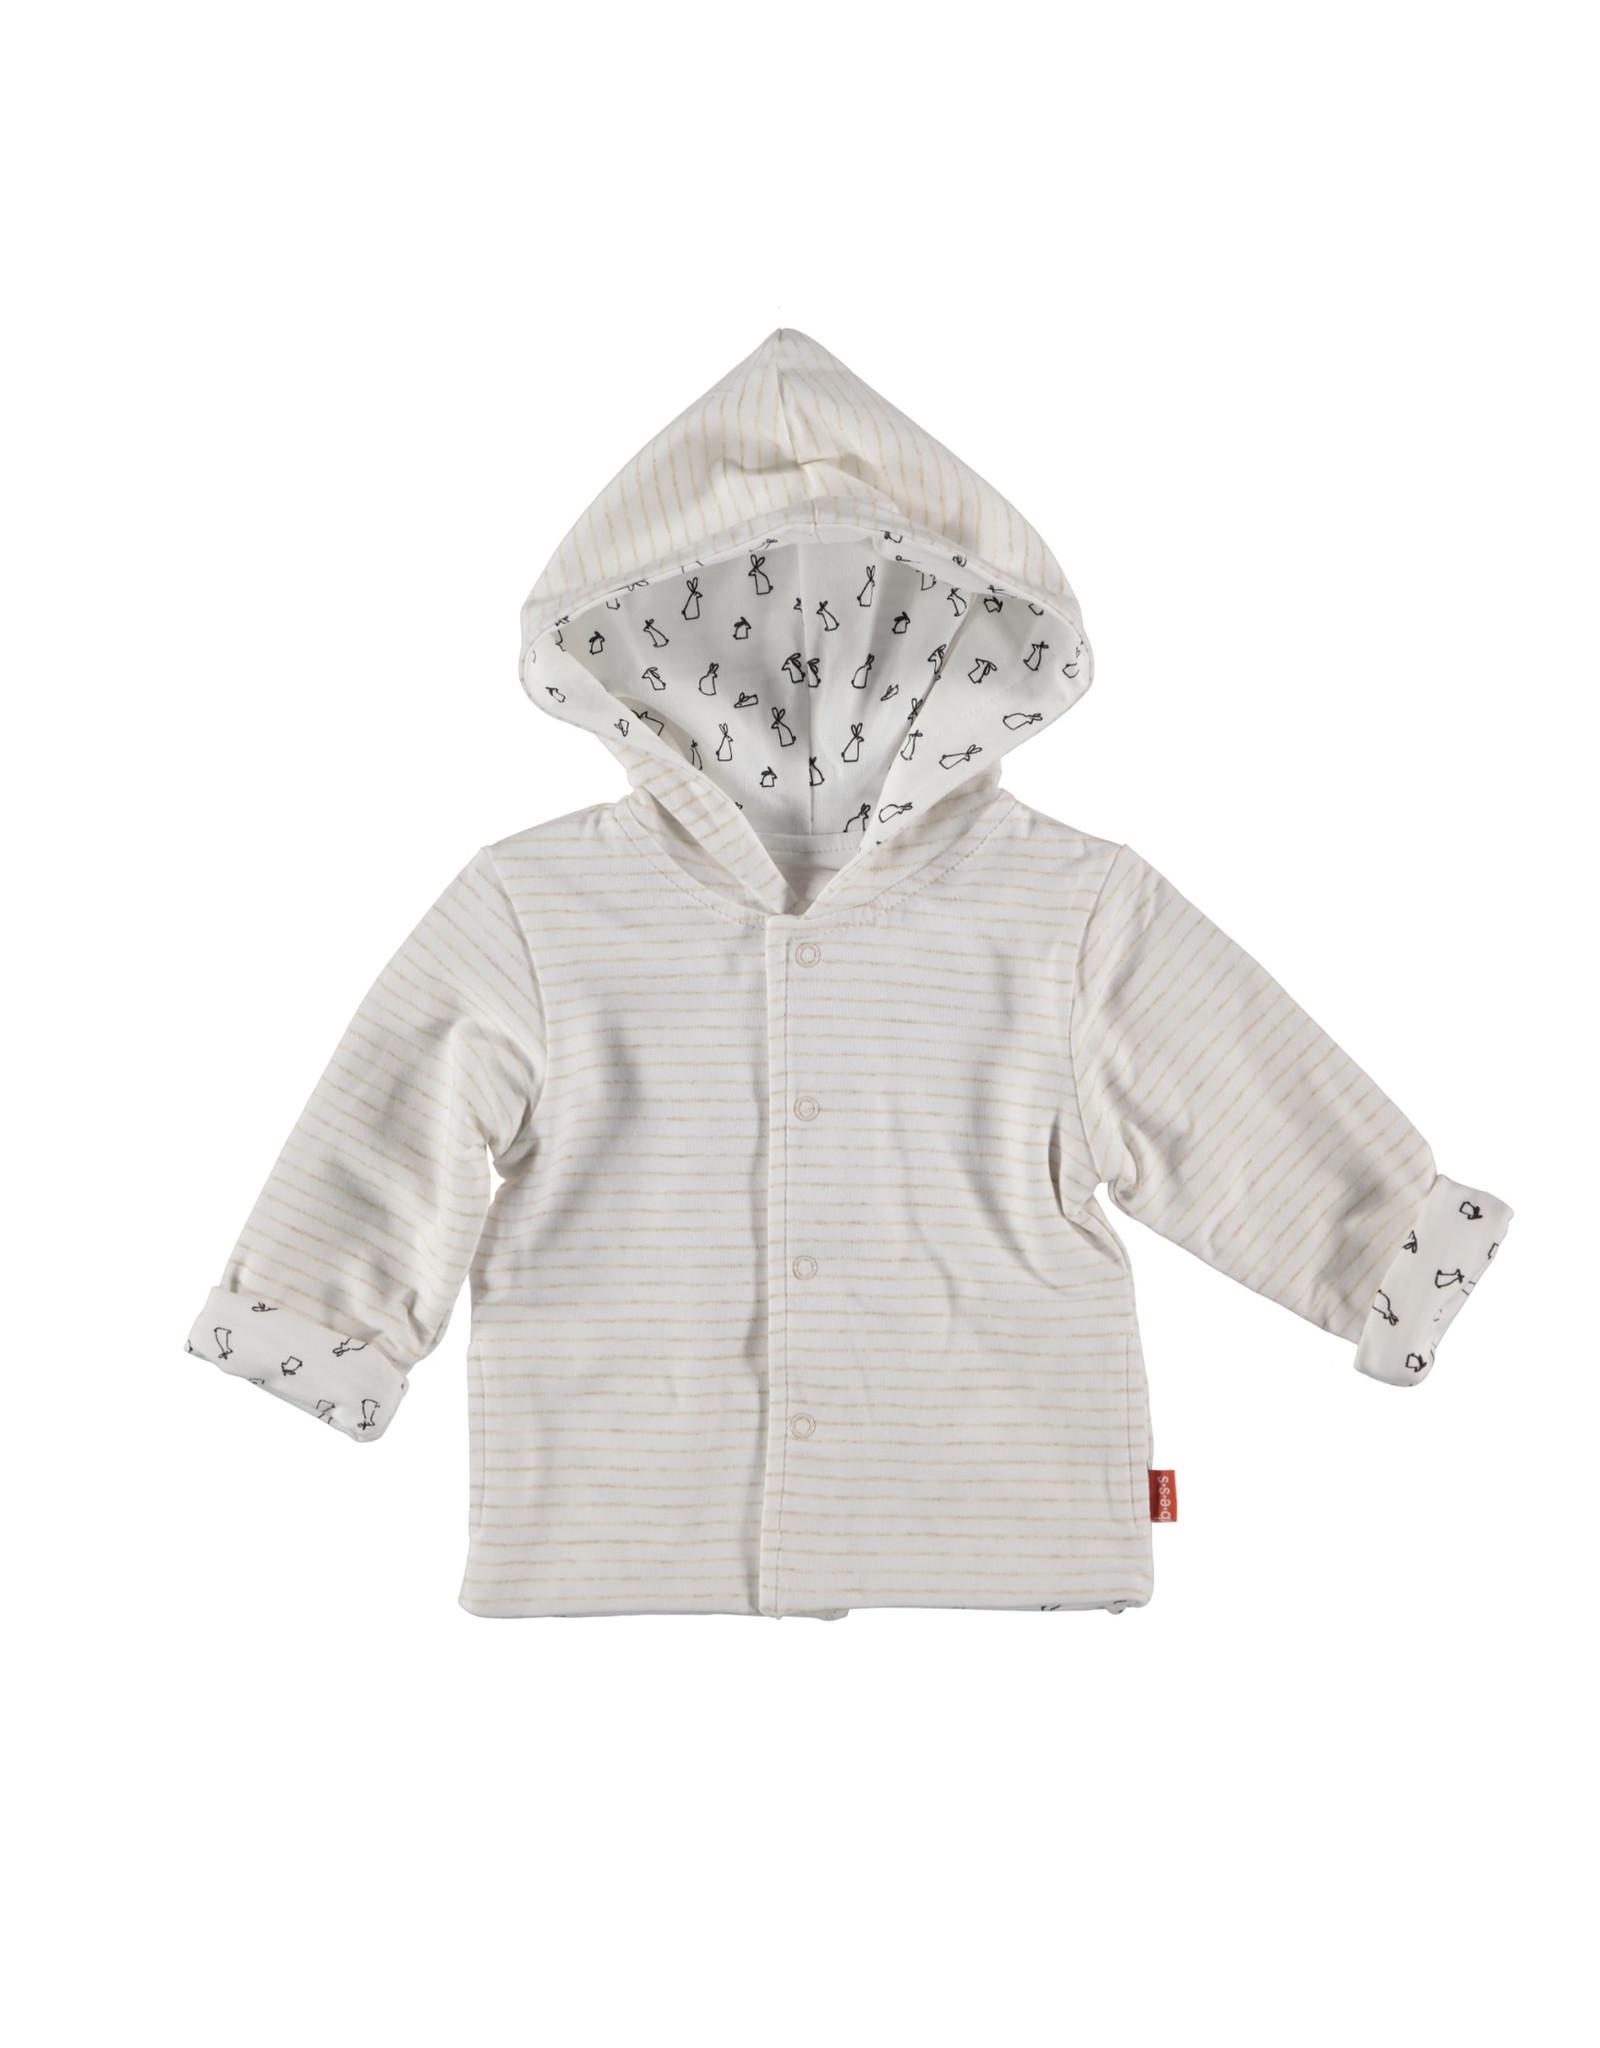 BESS Cardigan Reversible White